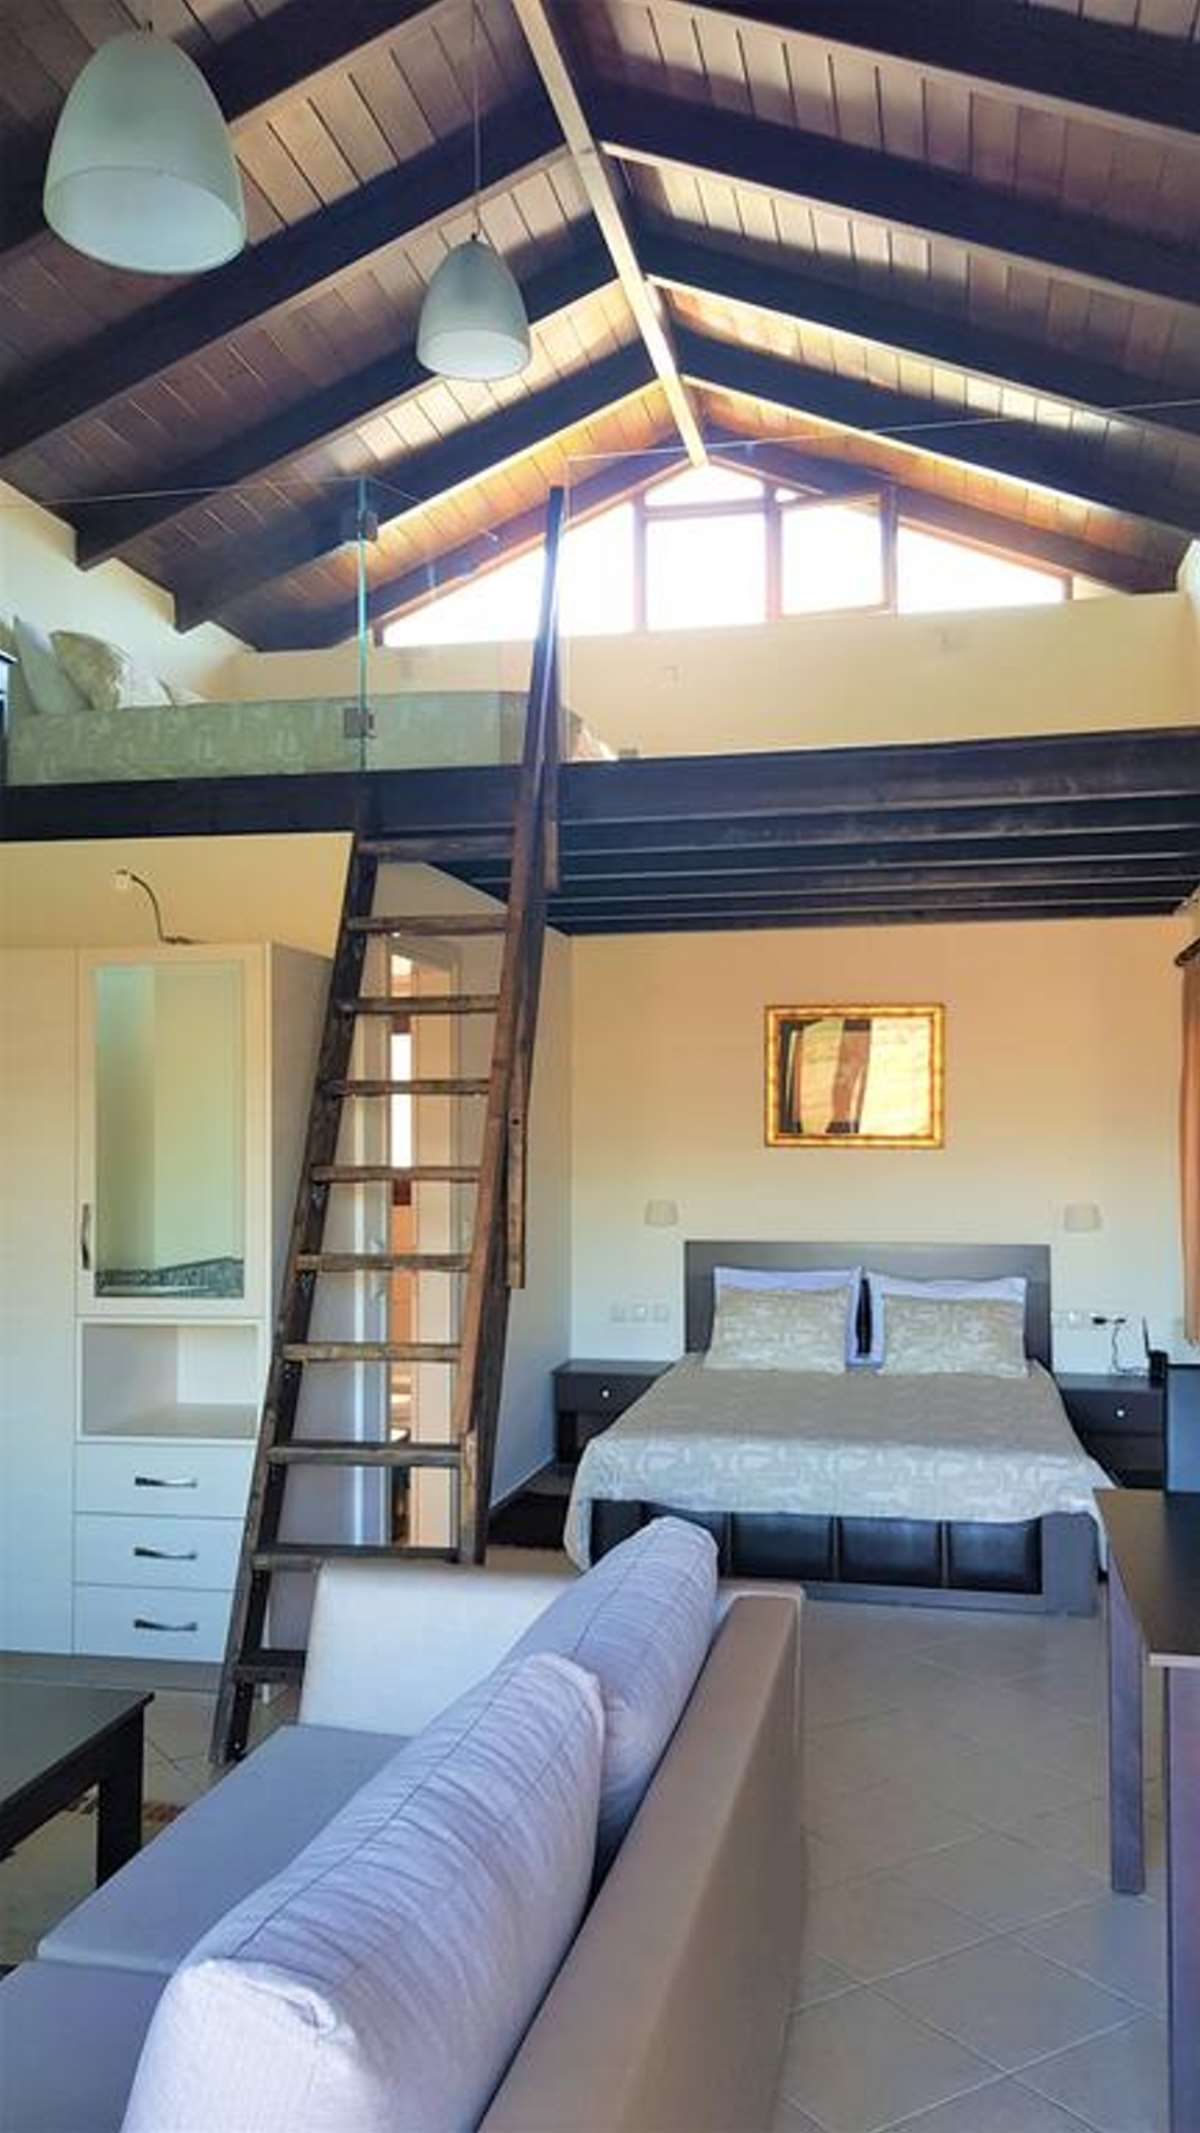 Lithos villas, Αμφίκλεια, μεζονέτα